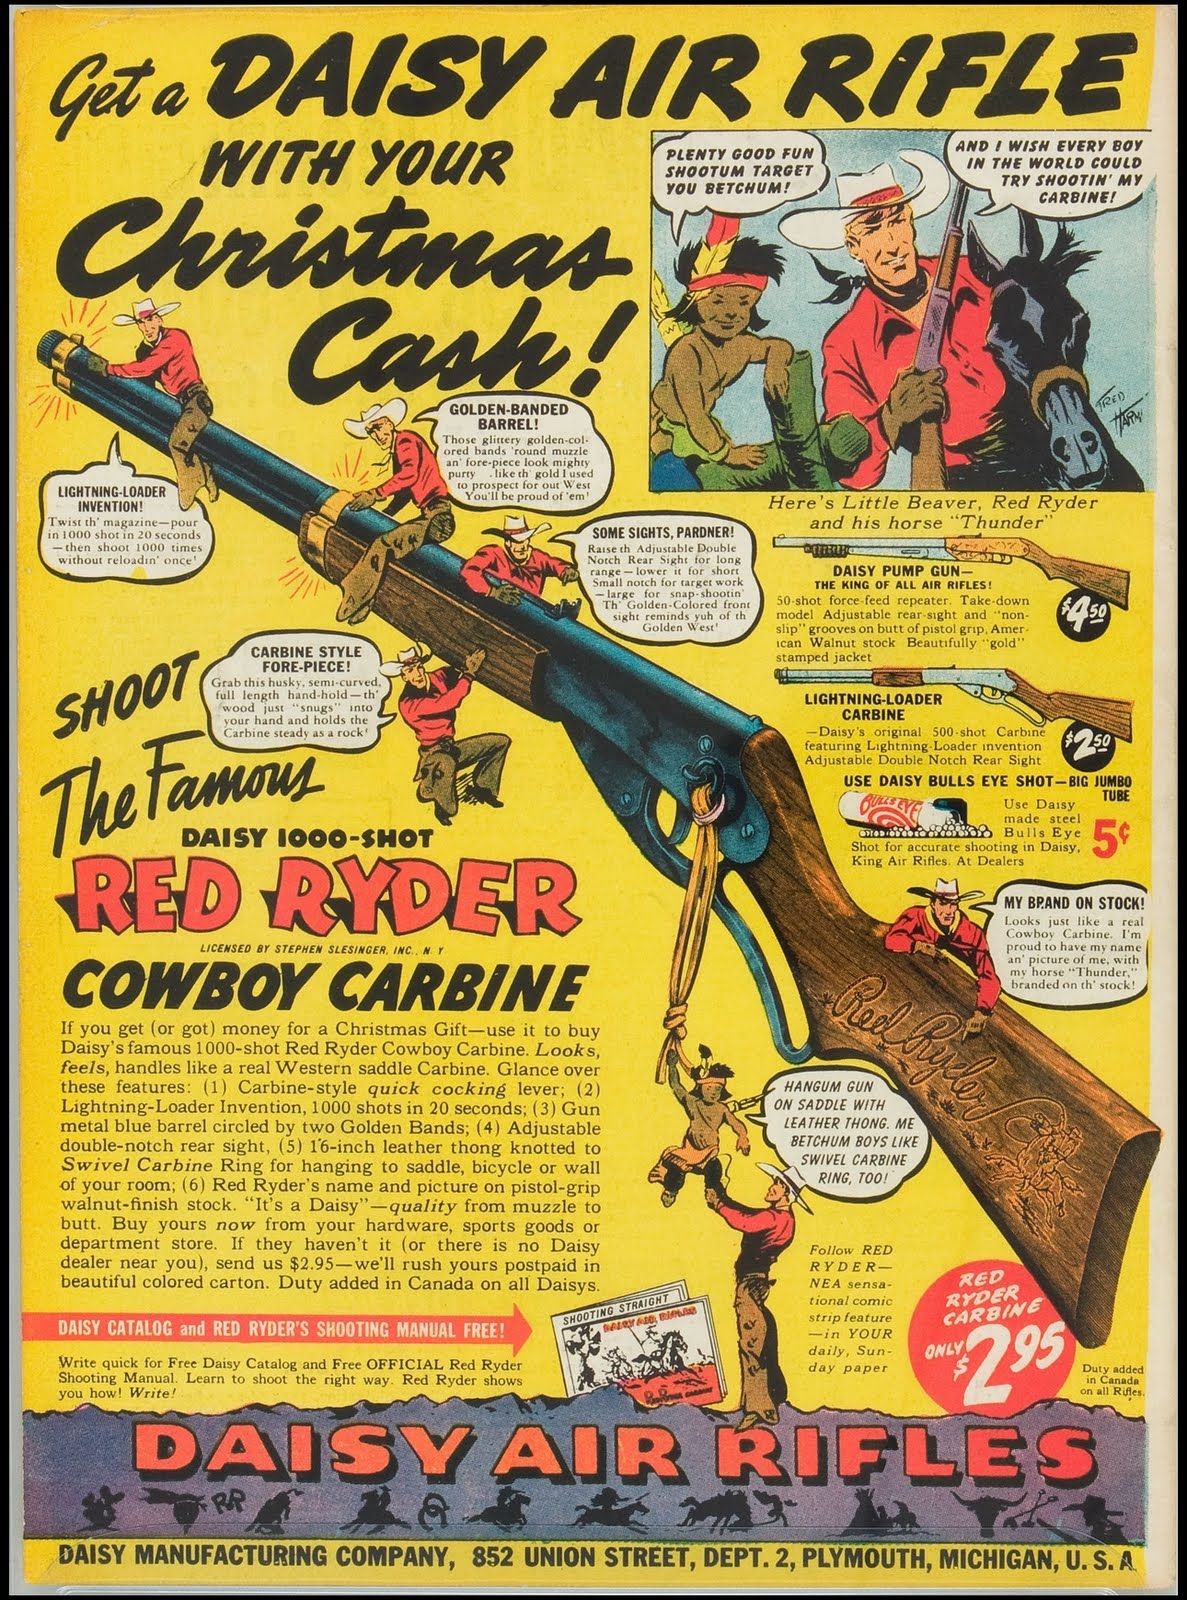 Daisy air rifle coupons